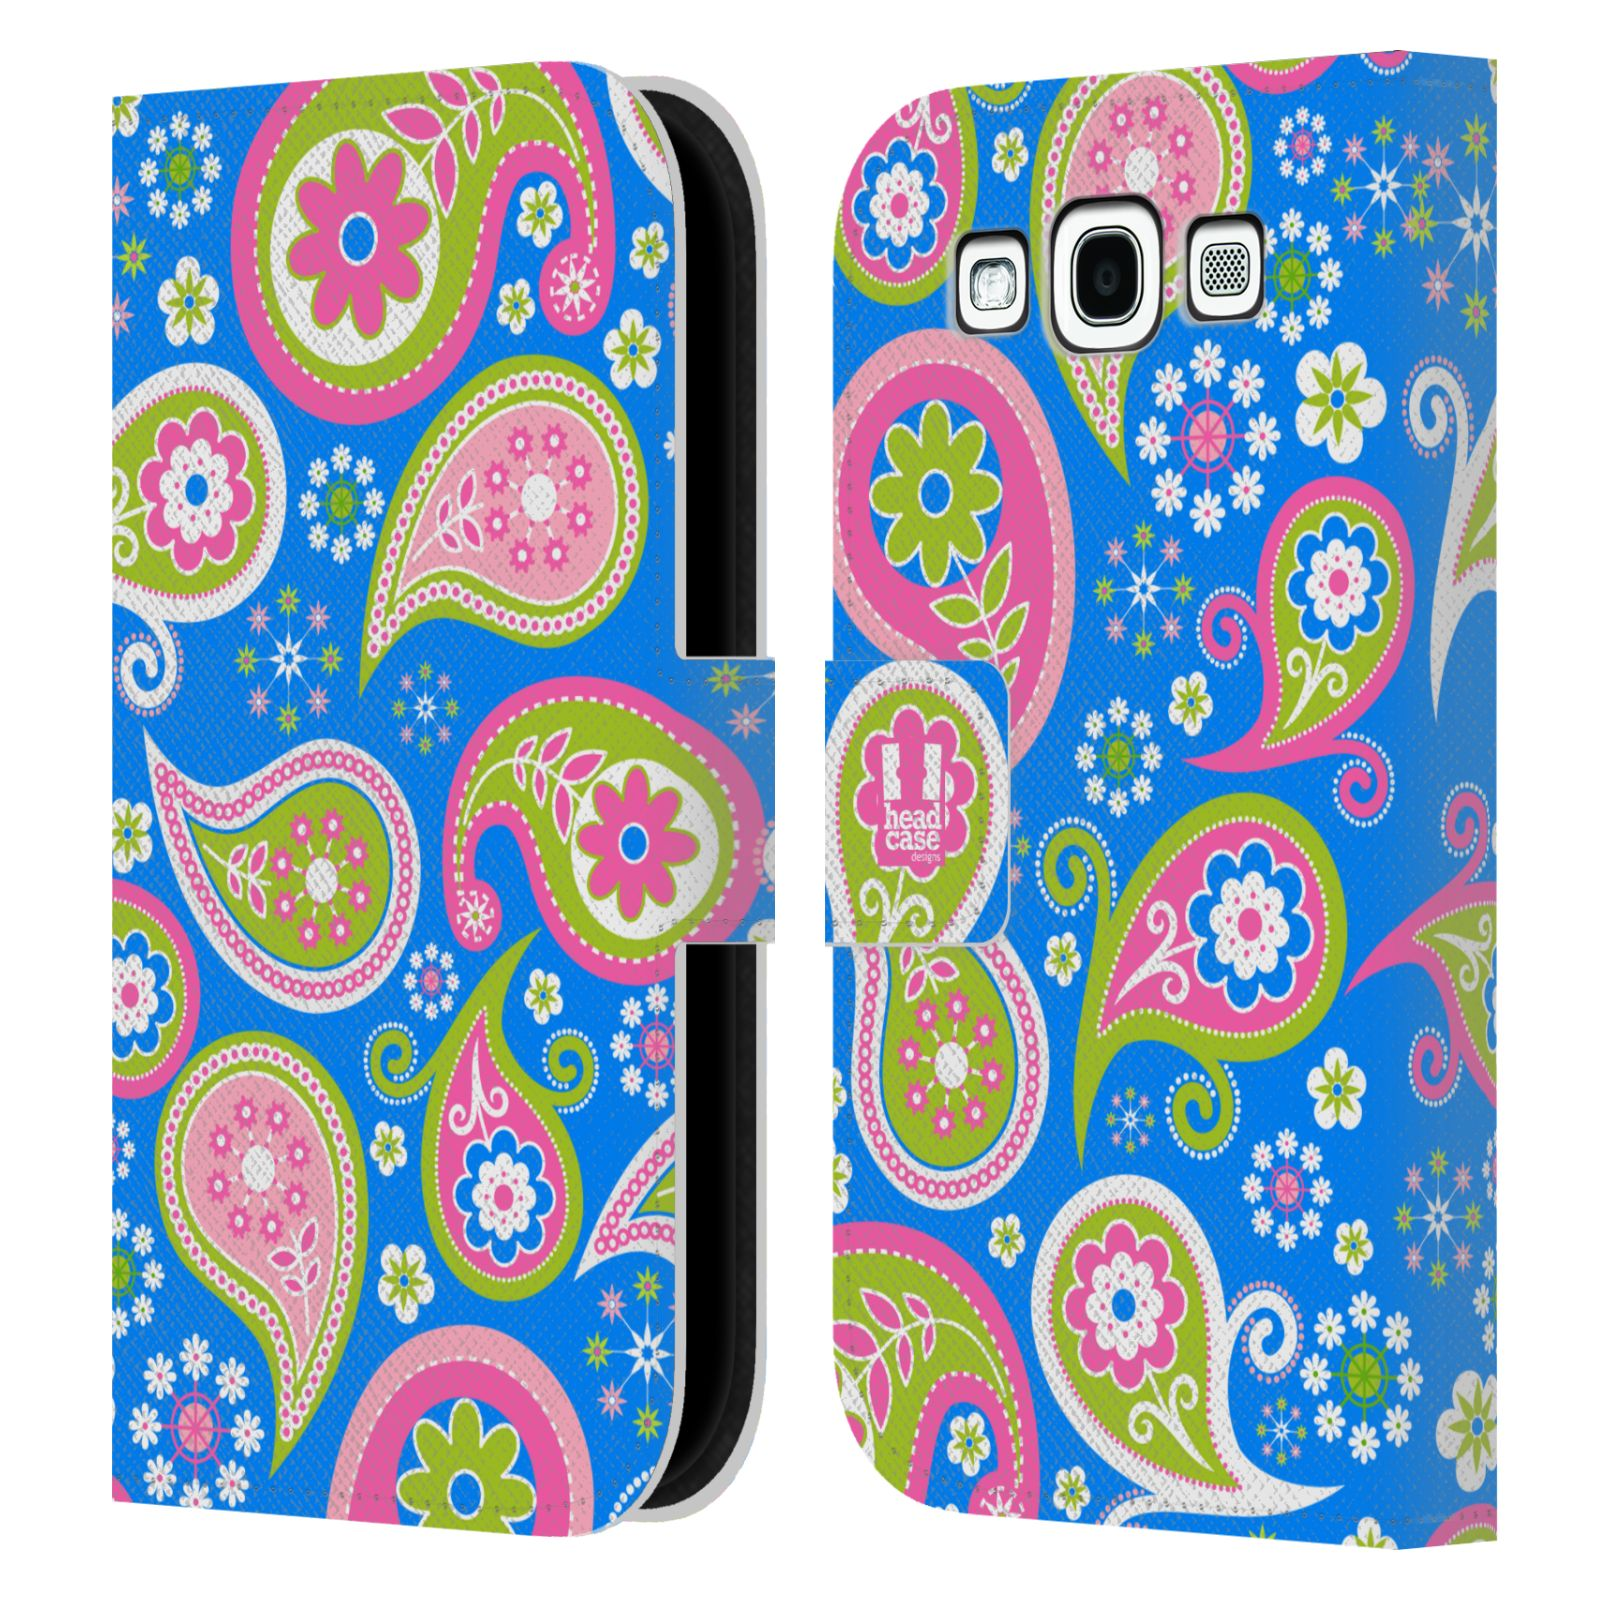 HEAD CASE Flipové pouzdro pro mobil Samsung Galaxy S3 snové slzy modrá